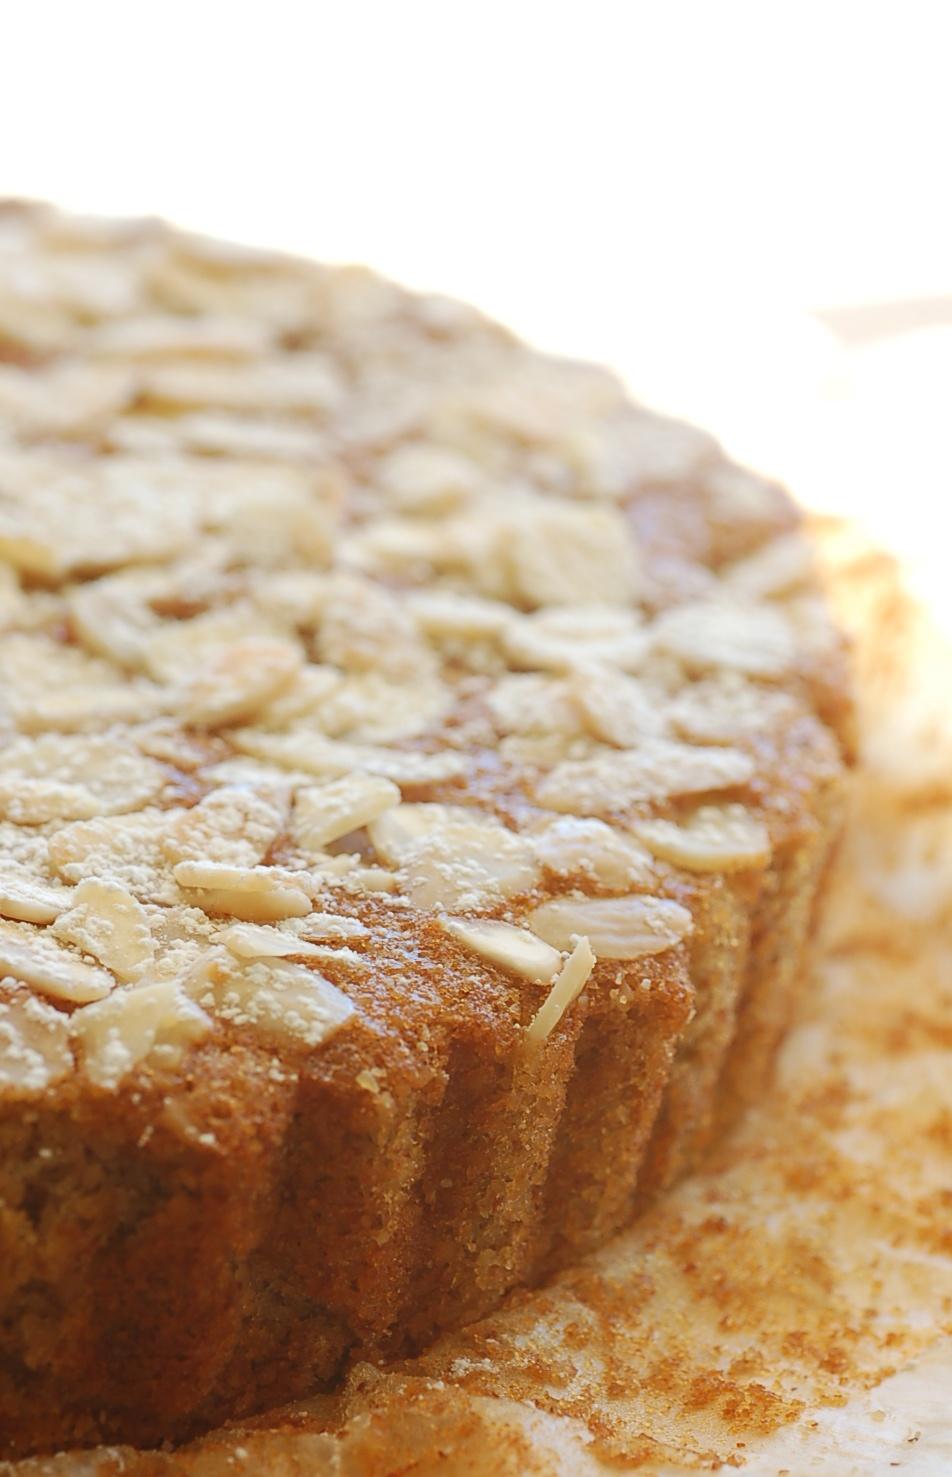 File:Supermoist banana and almond cake.jpg - Wikimedia Commons